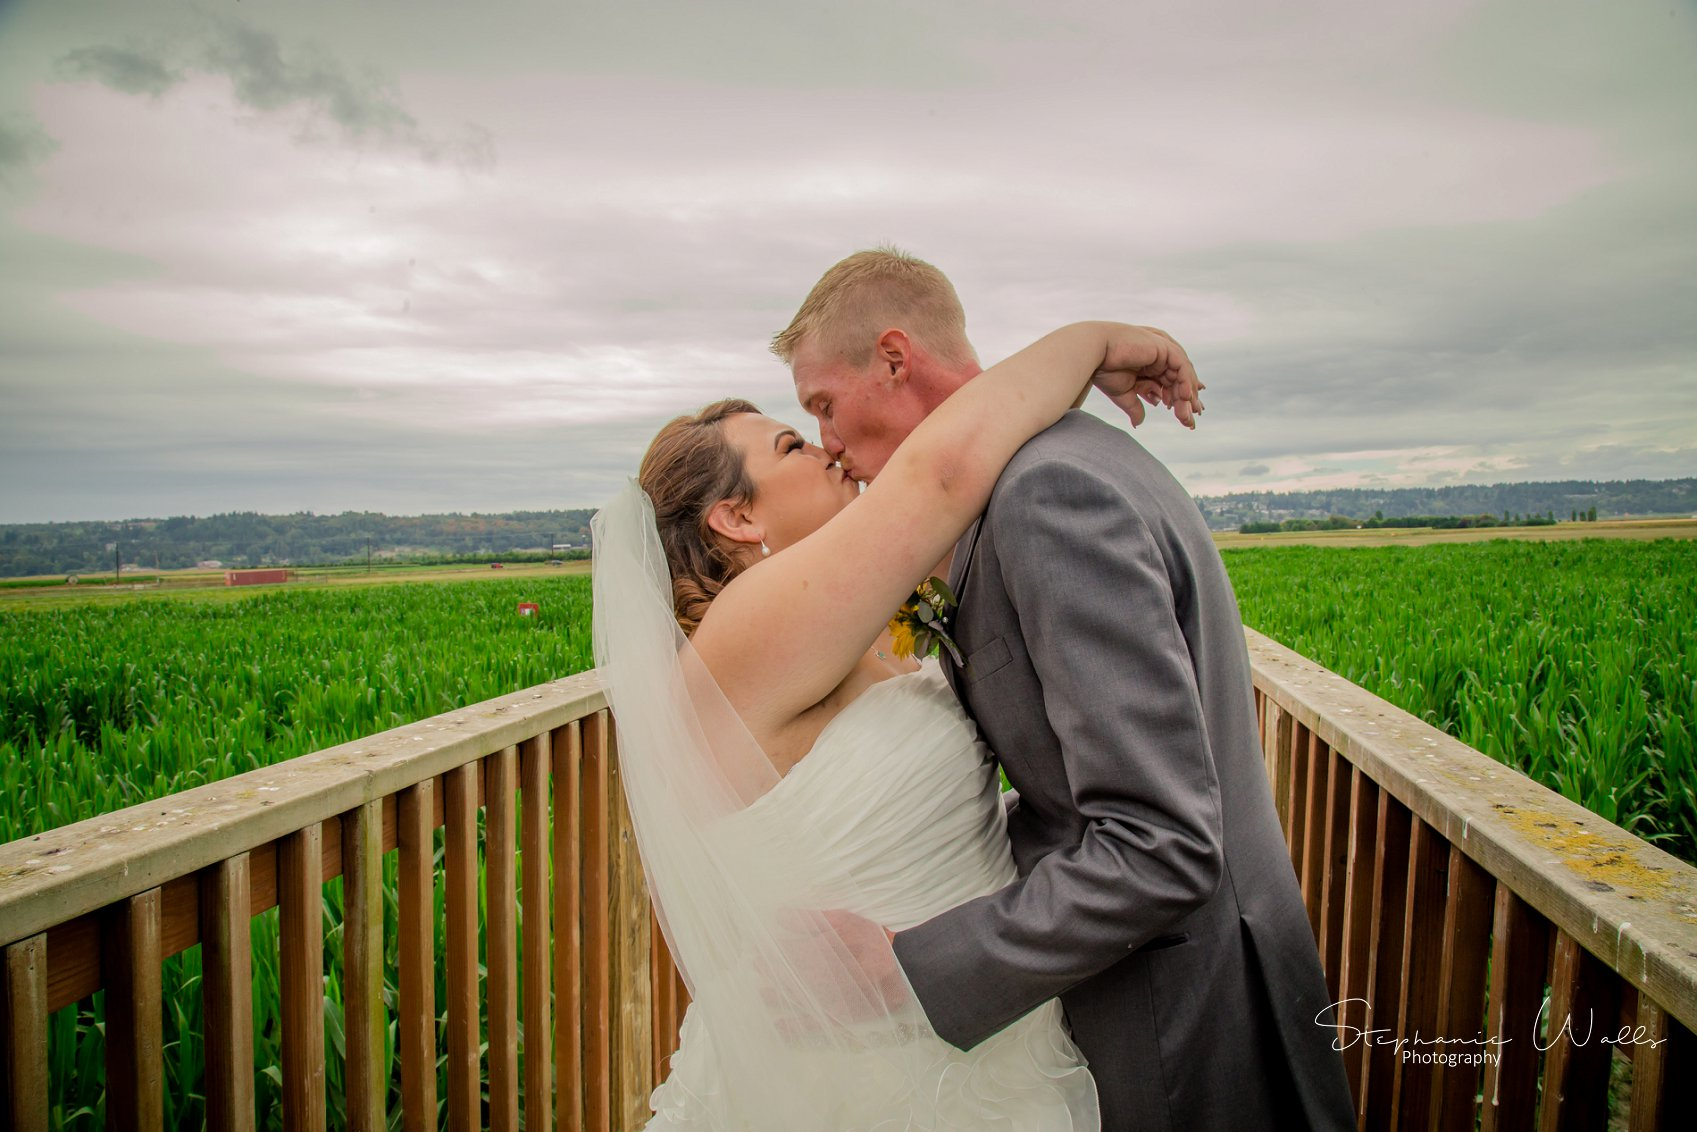 Kimble Wedding 044 Marlena & Allans | Snohomish Red Barn Events (Stocker Farms) | Snohomish, Wa Wedding Photographer